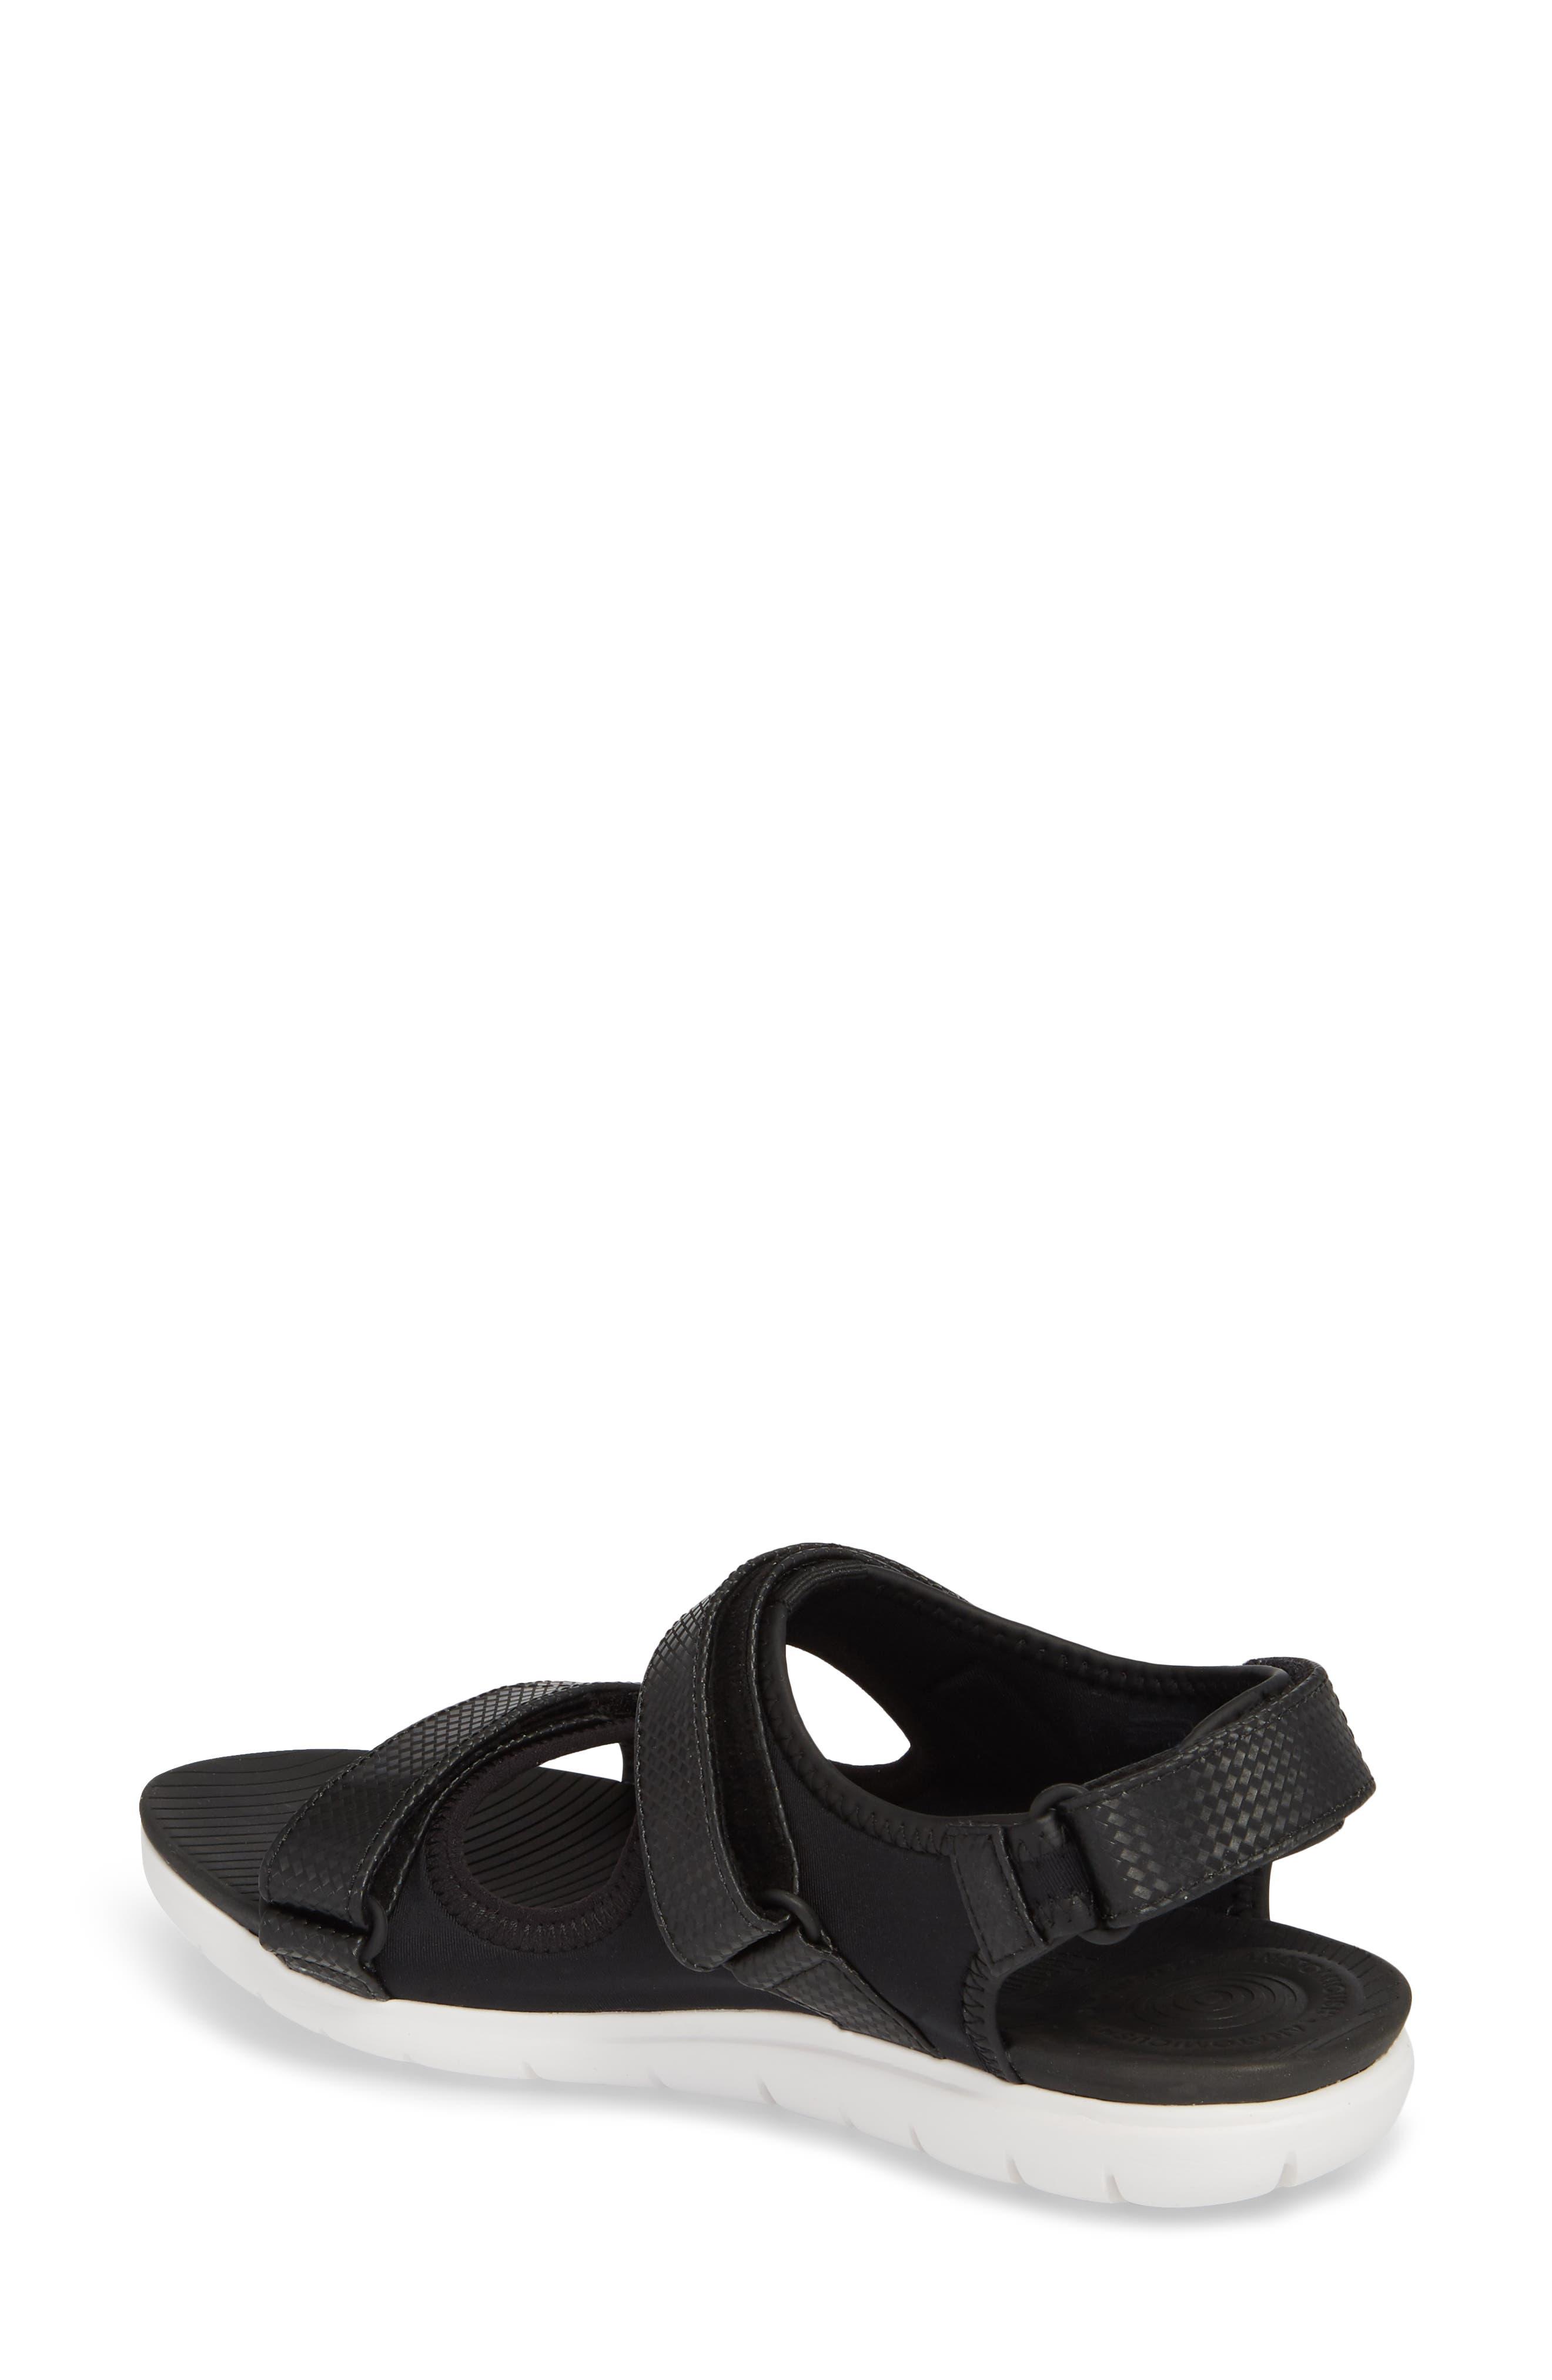 FitfFlop Neoflex<sup>™</sup> Back Strap Sandal,                             Alternate thumbnail 2, color,                             Black Leather